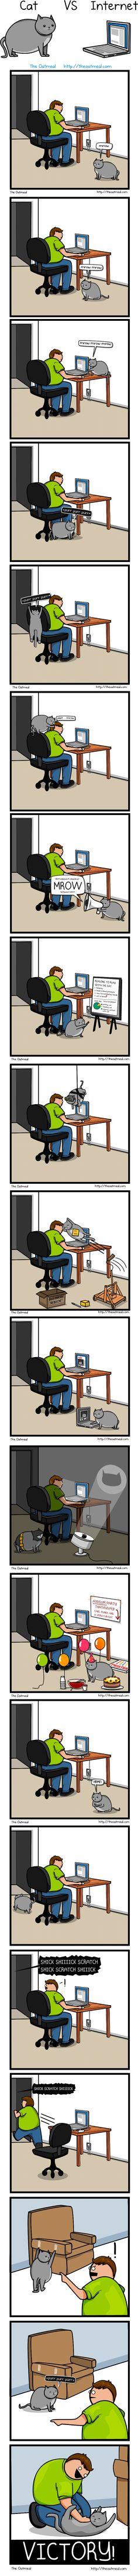 Cat-VS Internet-576-large.jpg (689×12848)